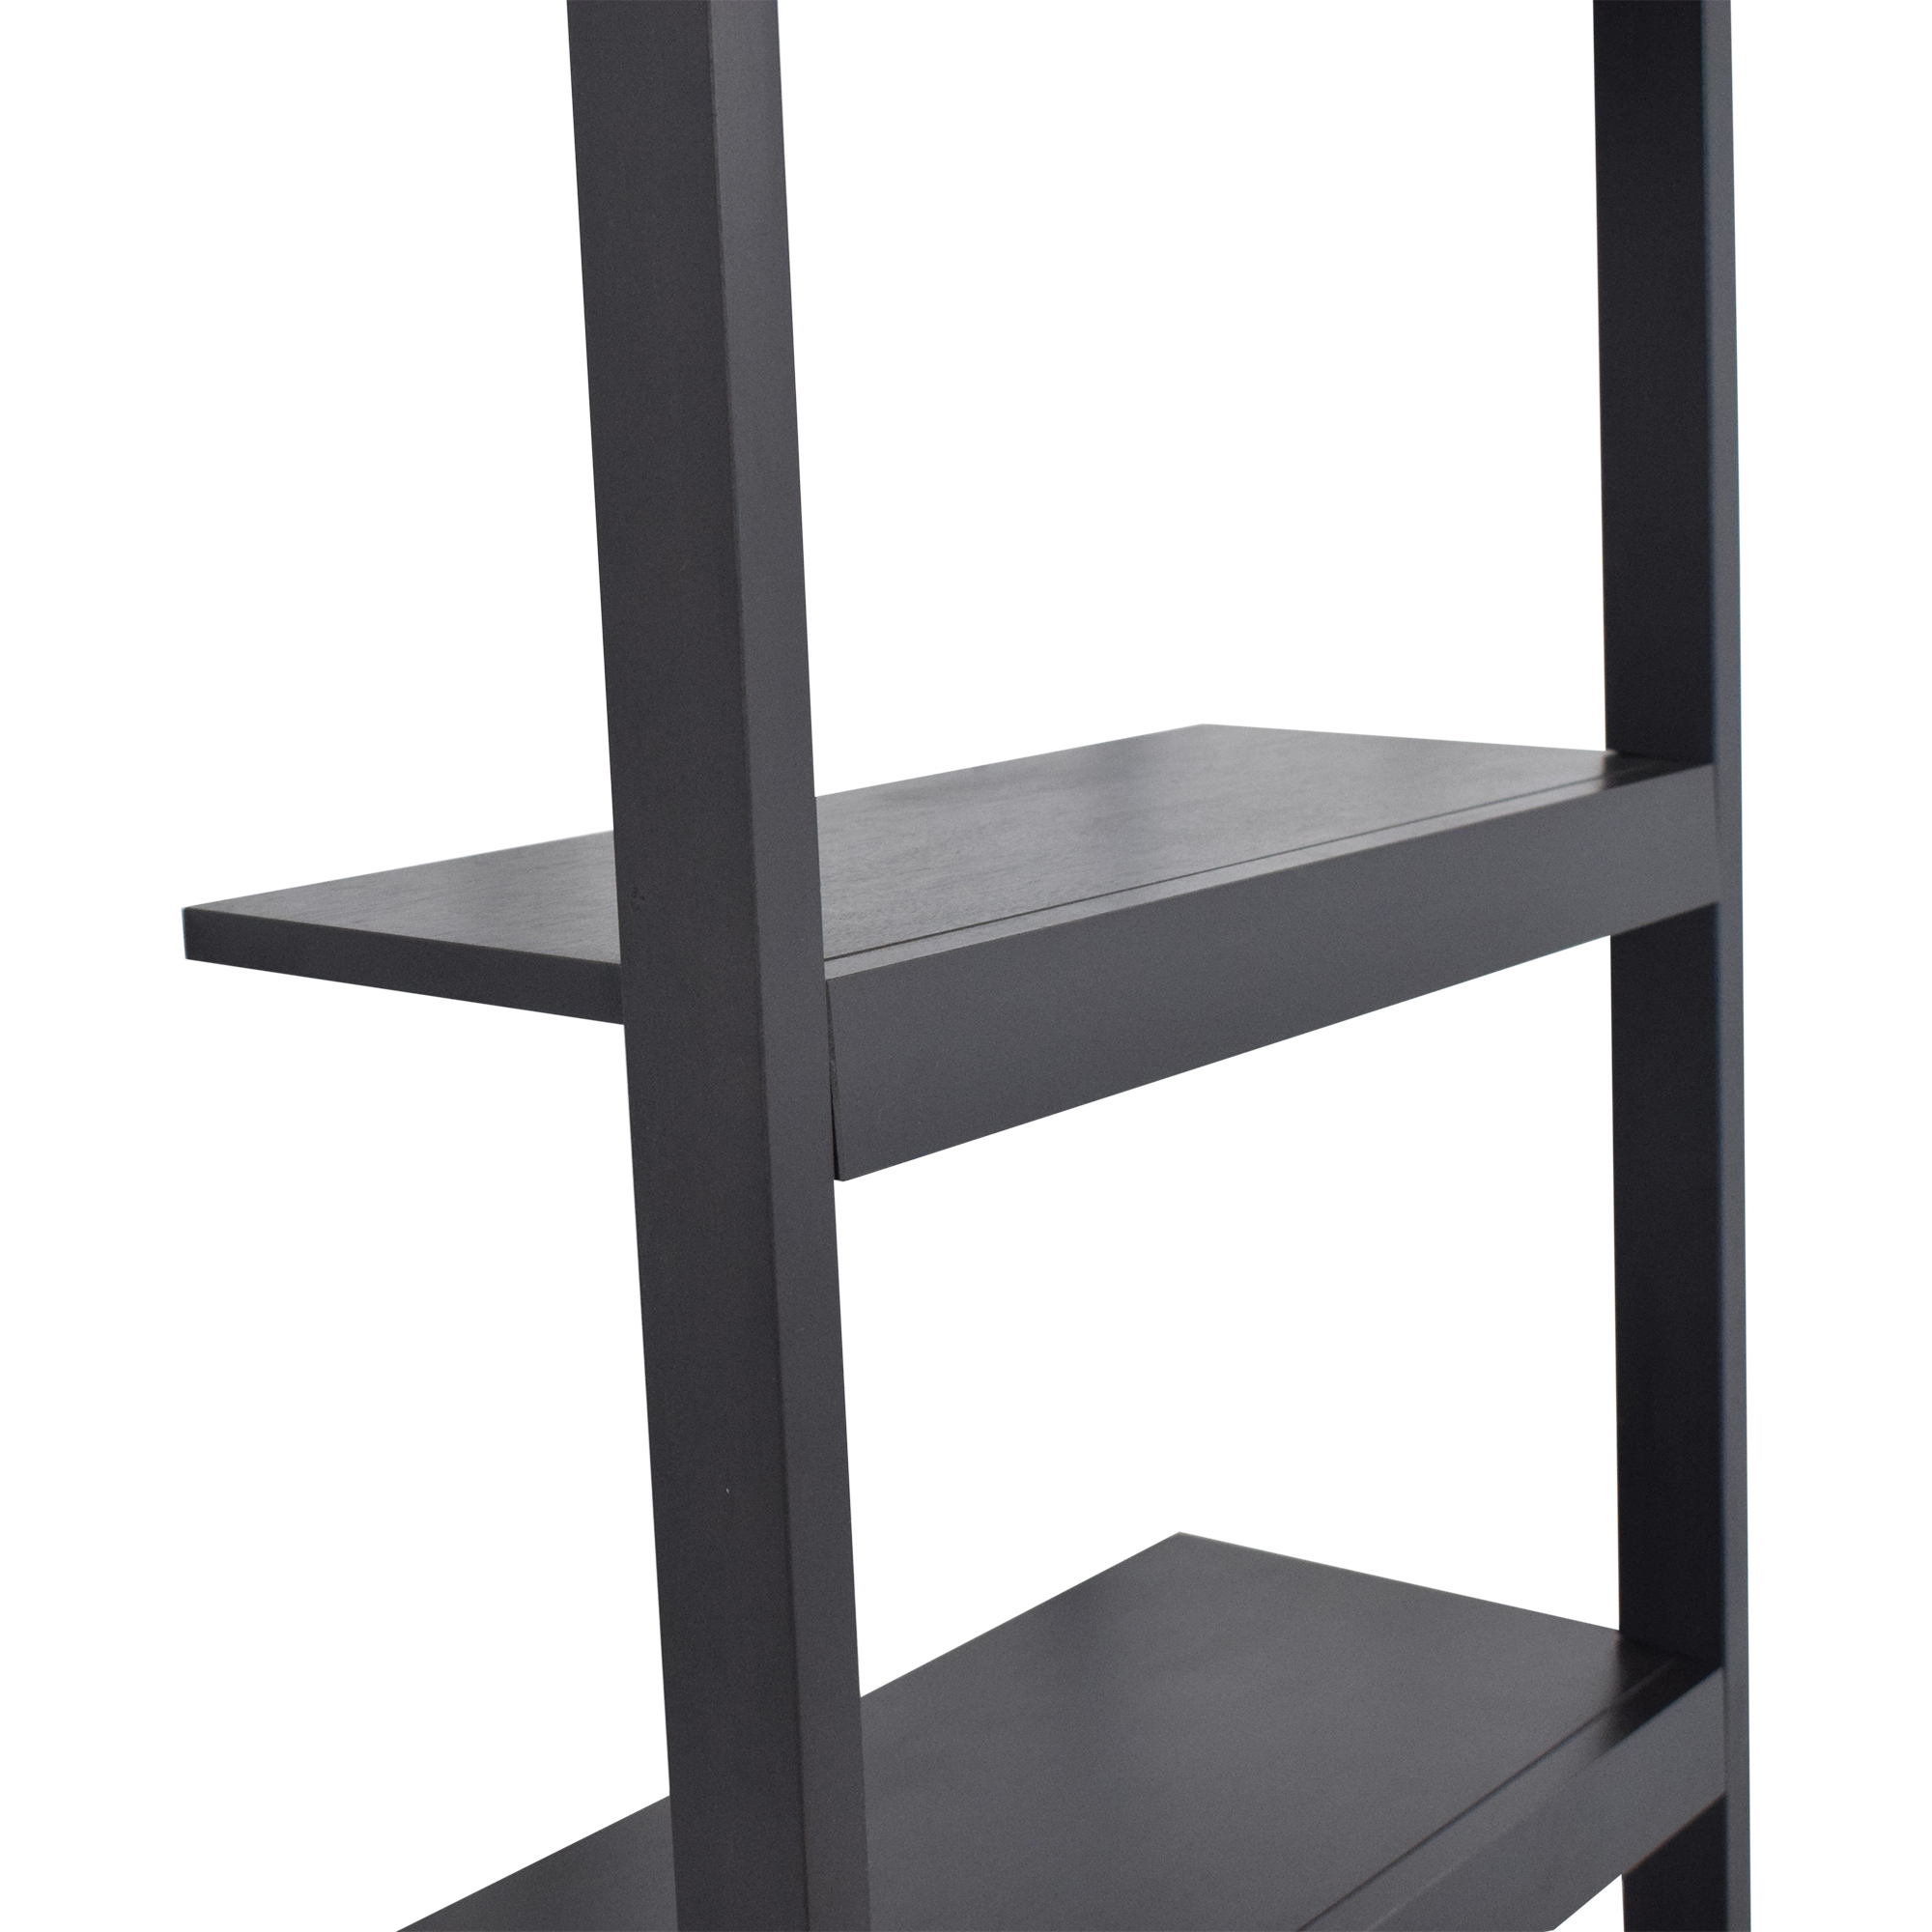 Crate & Barrel Sloane Black Leaning Bookshelf / Storage